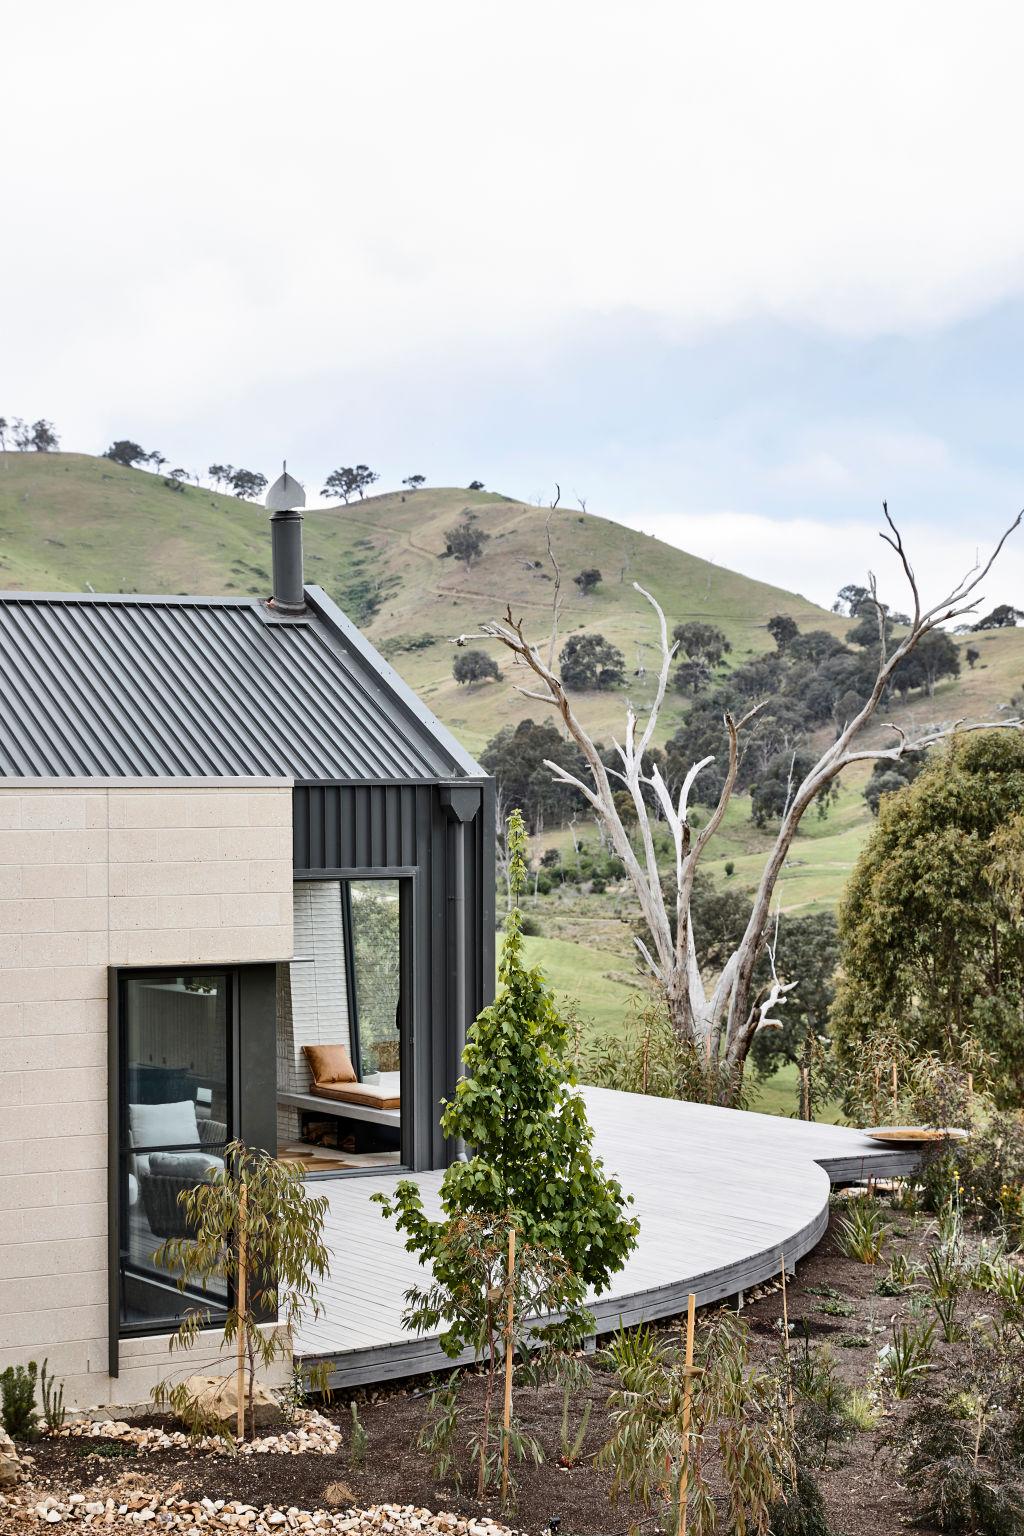 Thornton Residence. Interior architecture by Doherty Design Studio.